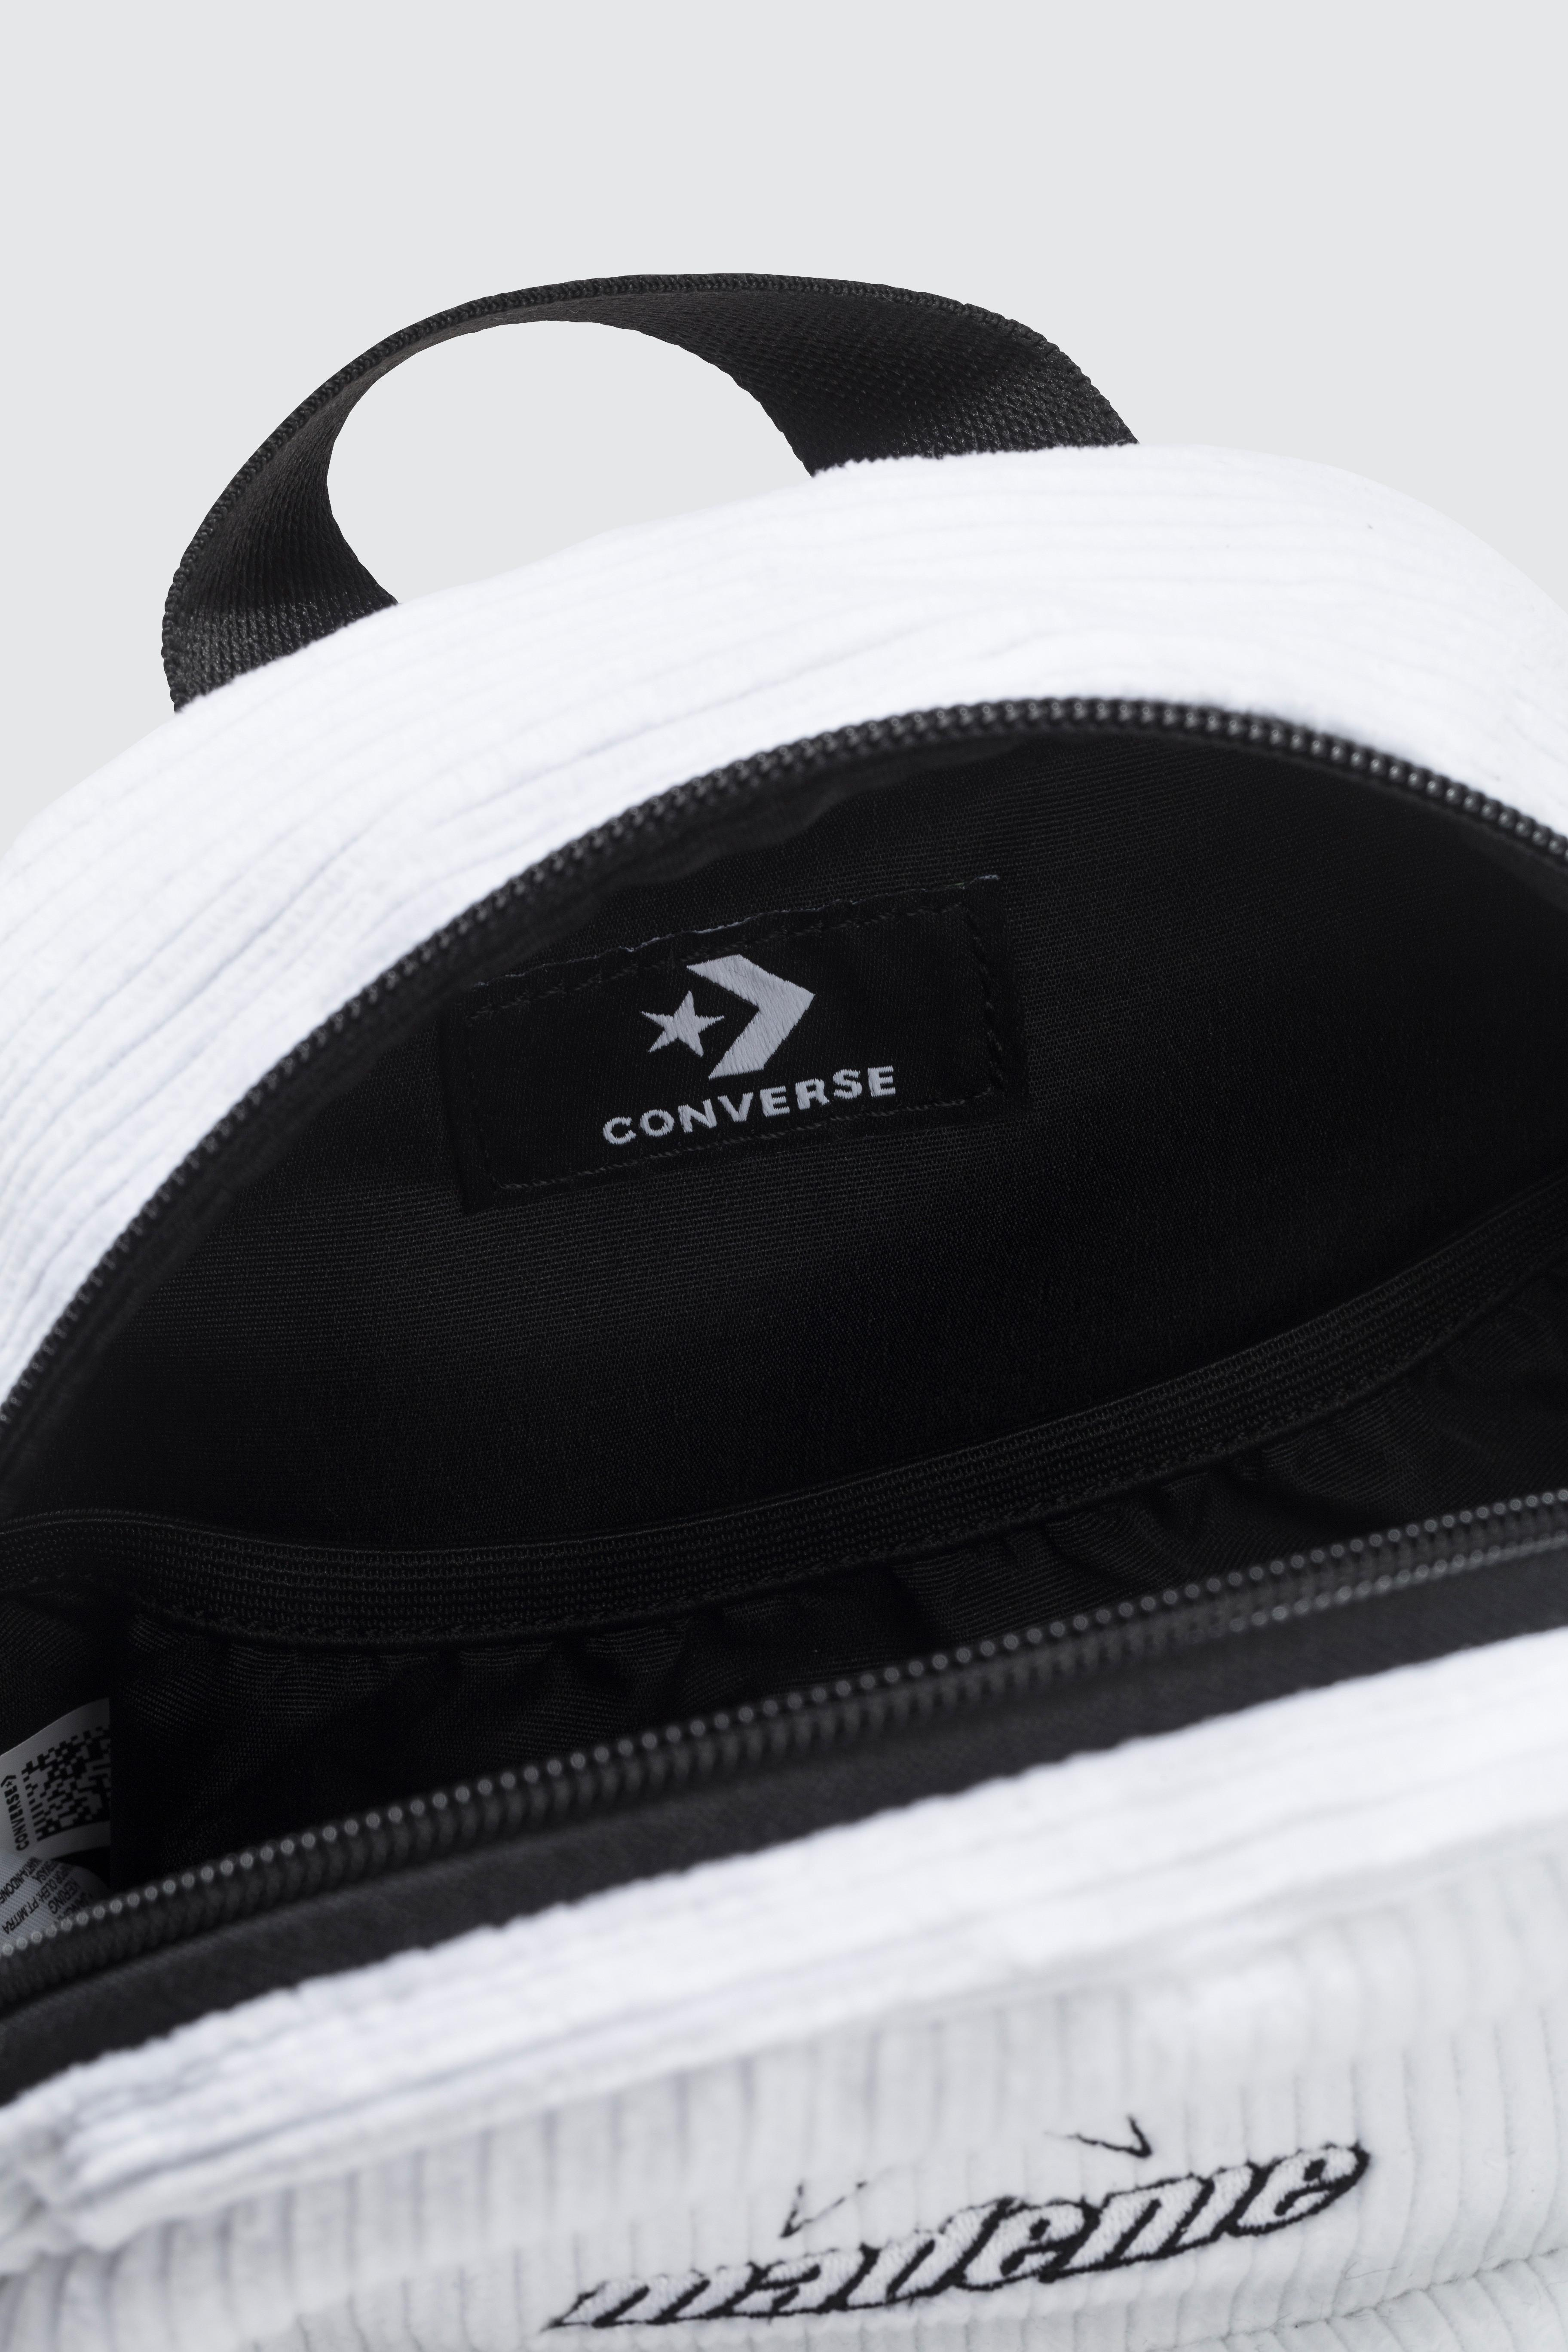 966f66522bf5 Lyst - Converse Mademe X Super Mini Backpack in White